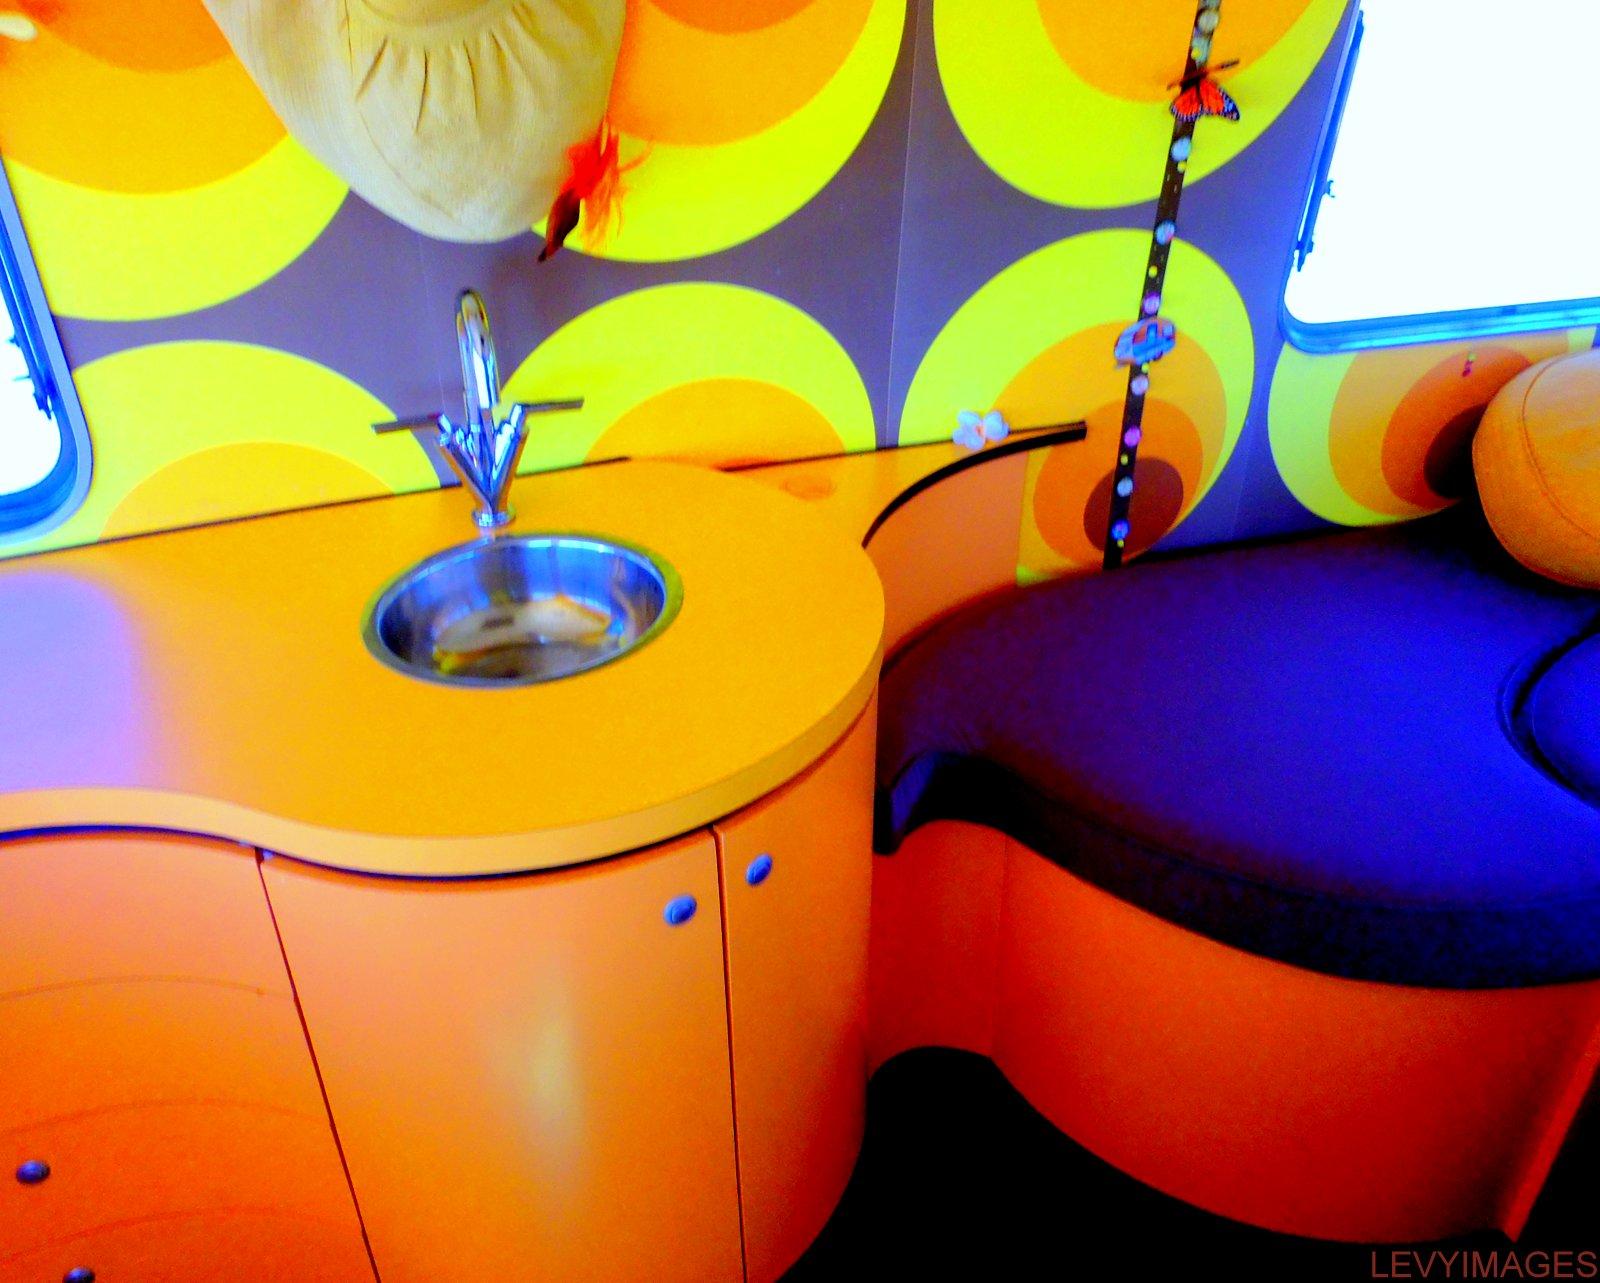 http://4.bp.blogspot.com/-MkNxleVMdPg/UT0OmSs7AgI/AAAAAAAANXM/rmEzCsnRsTg/s1600/bubbles-retro-artdeco-vintage-fibreglass-1972-oxford-concord-new-zealand-caravan-hil-mario-stapper-life-enjoyers-wanaka-freedom-camping-the-flying-tortoise-003.jpg